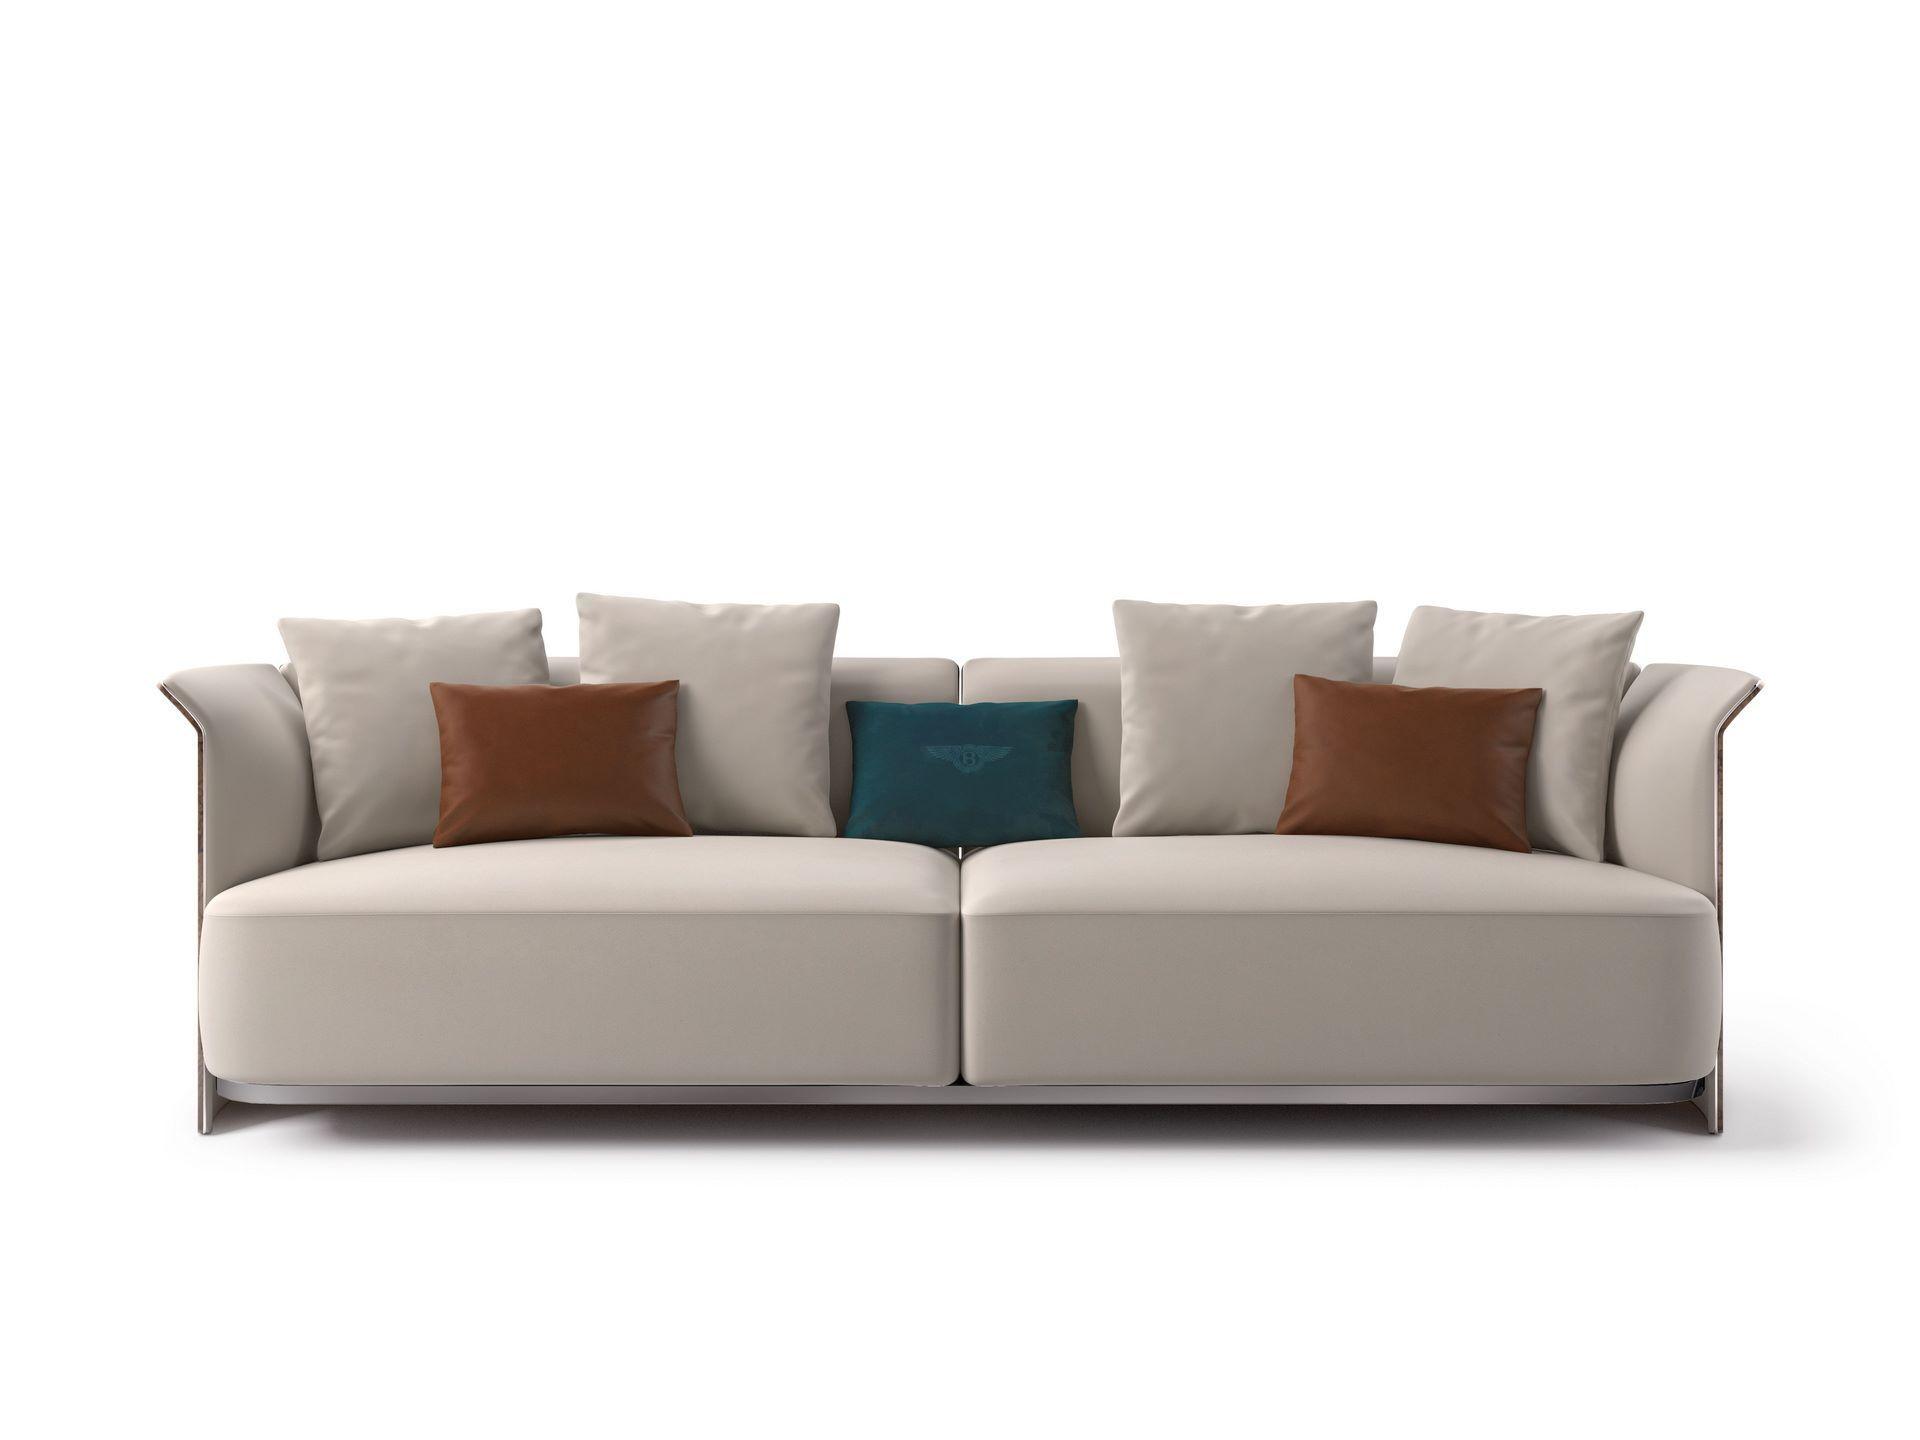 Bentley-Home-Collection-Ramsey-3-seater-sofa-7_2